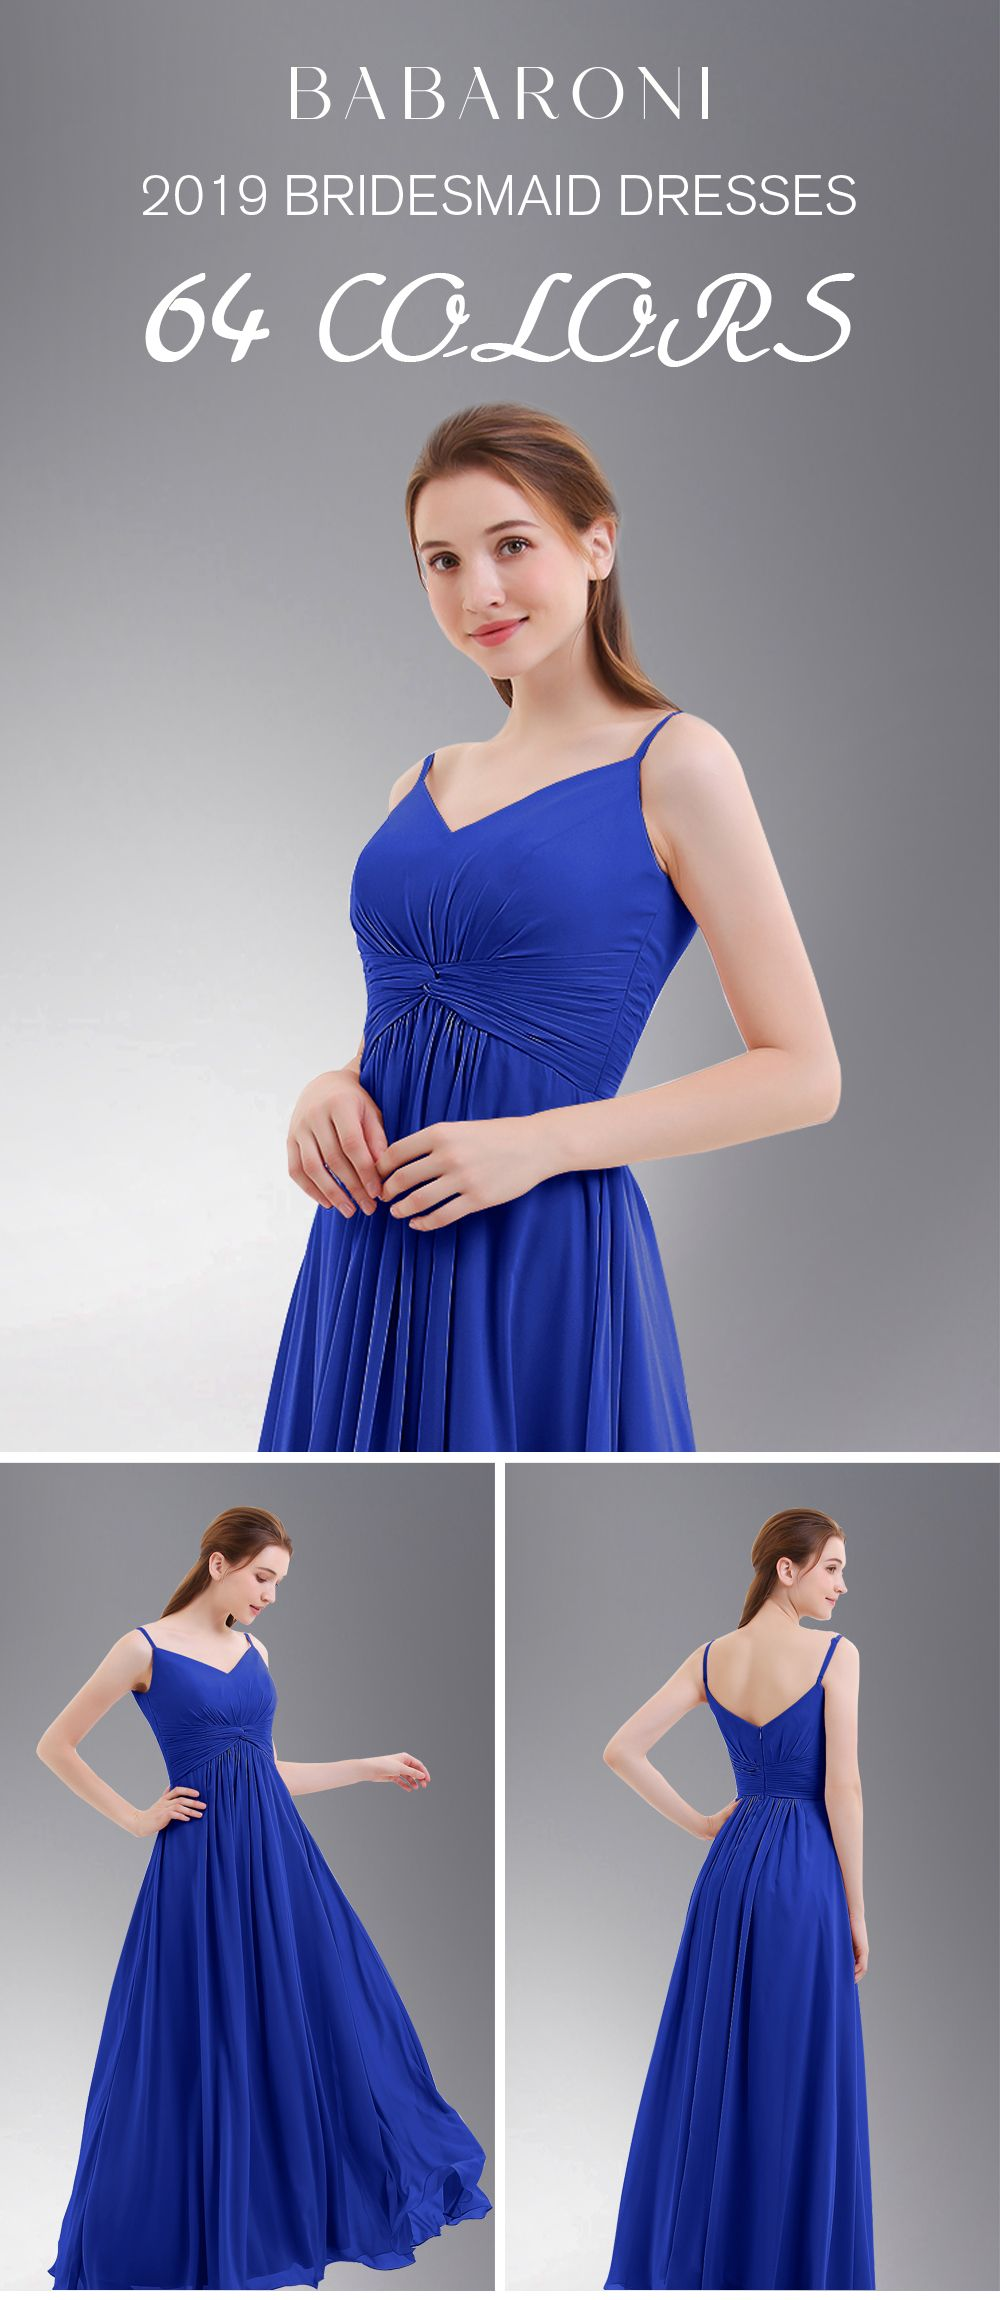 cb7545a2a021bf Elegant Royal Blue Bridesmaid Dresses - Gomes Weine AG